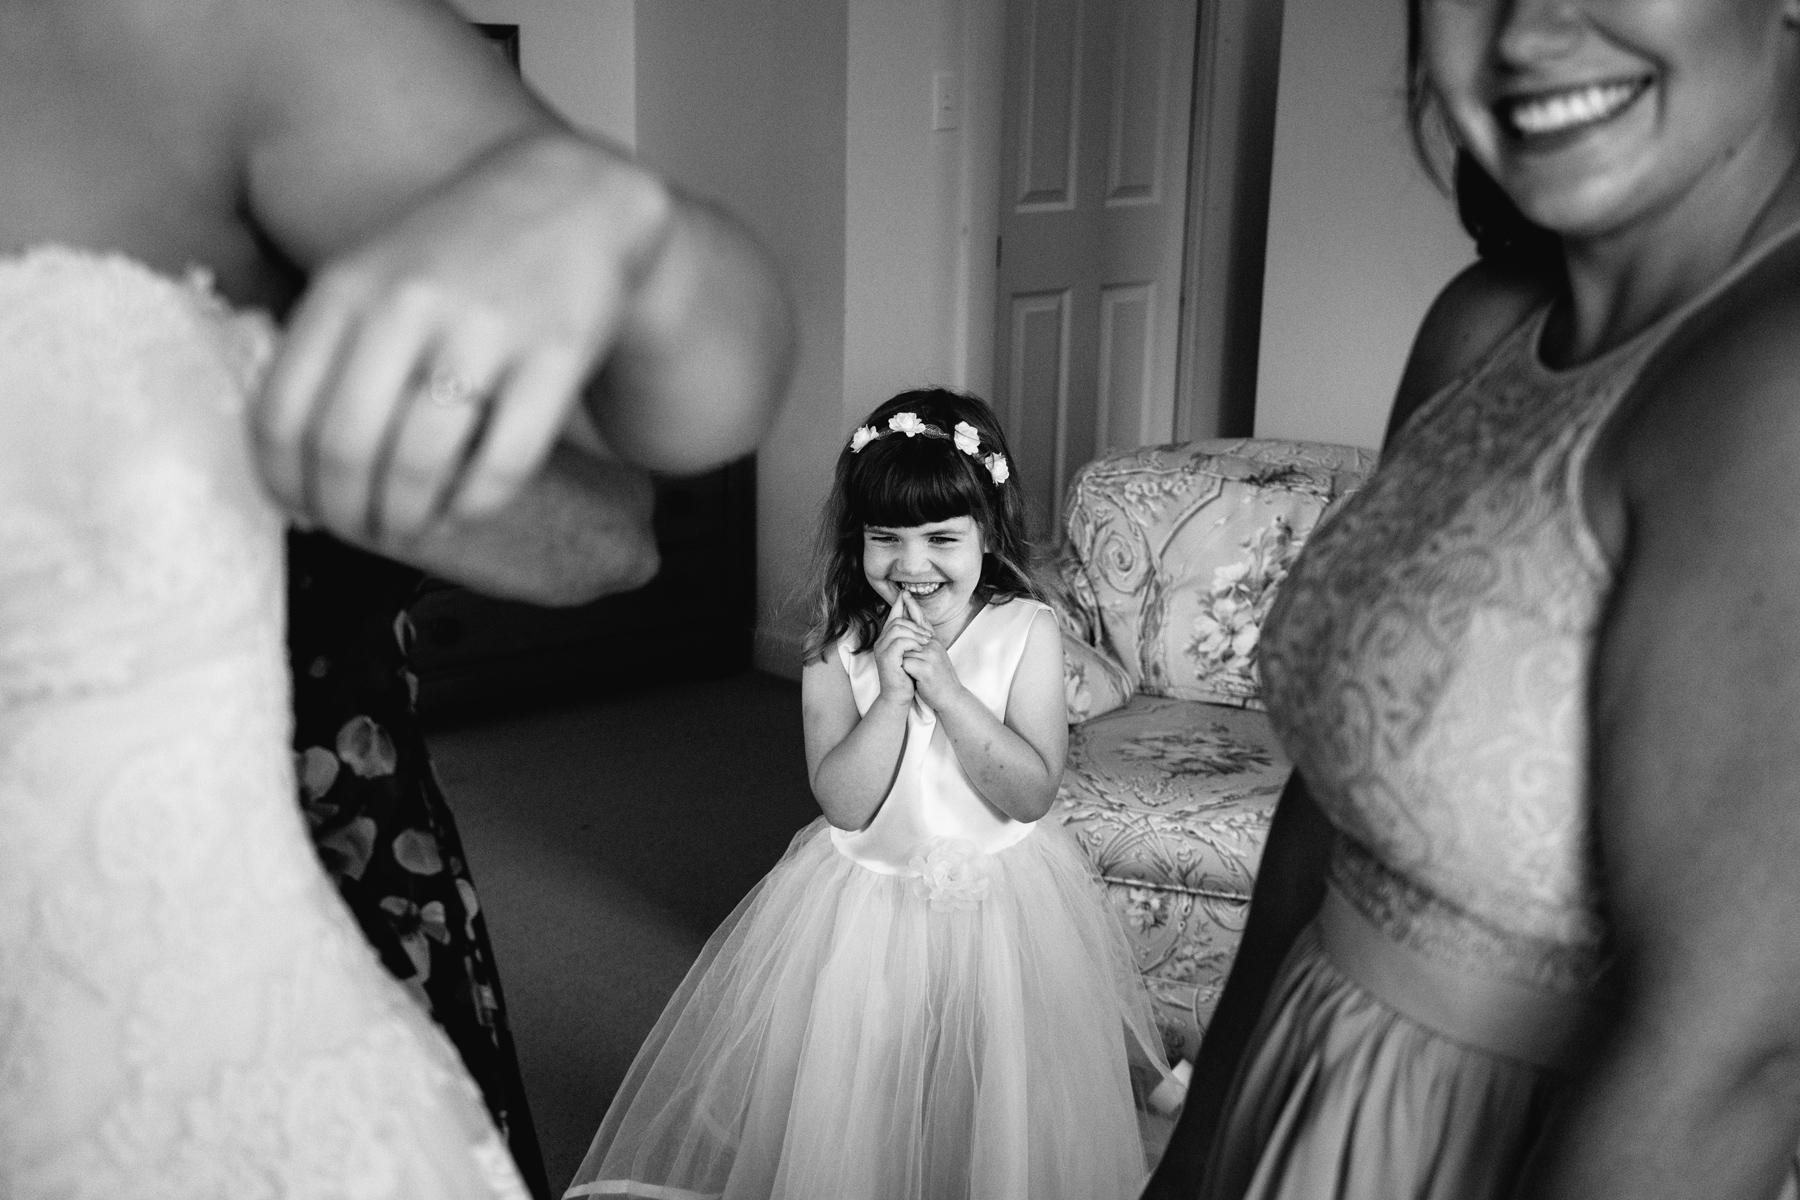 inn-spry-point-wedding-photography-pei-kandisebrown-jm2018-13